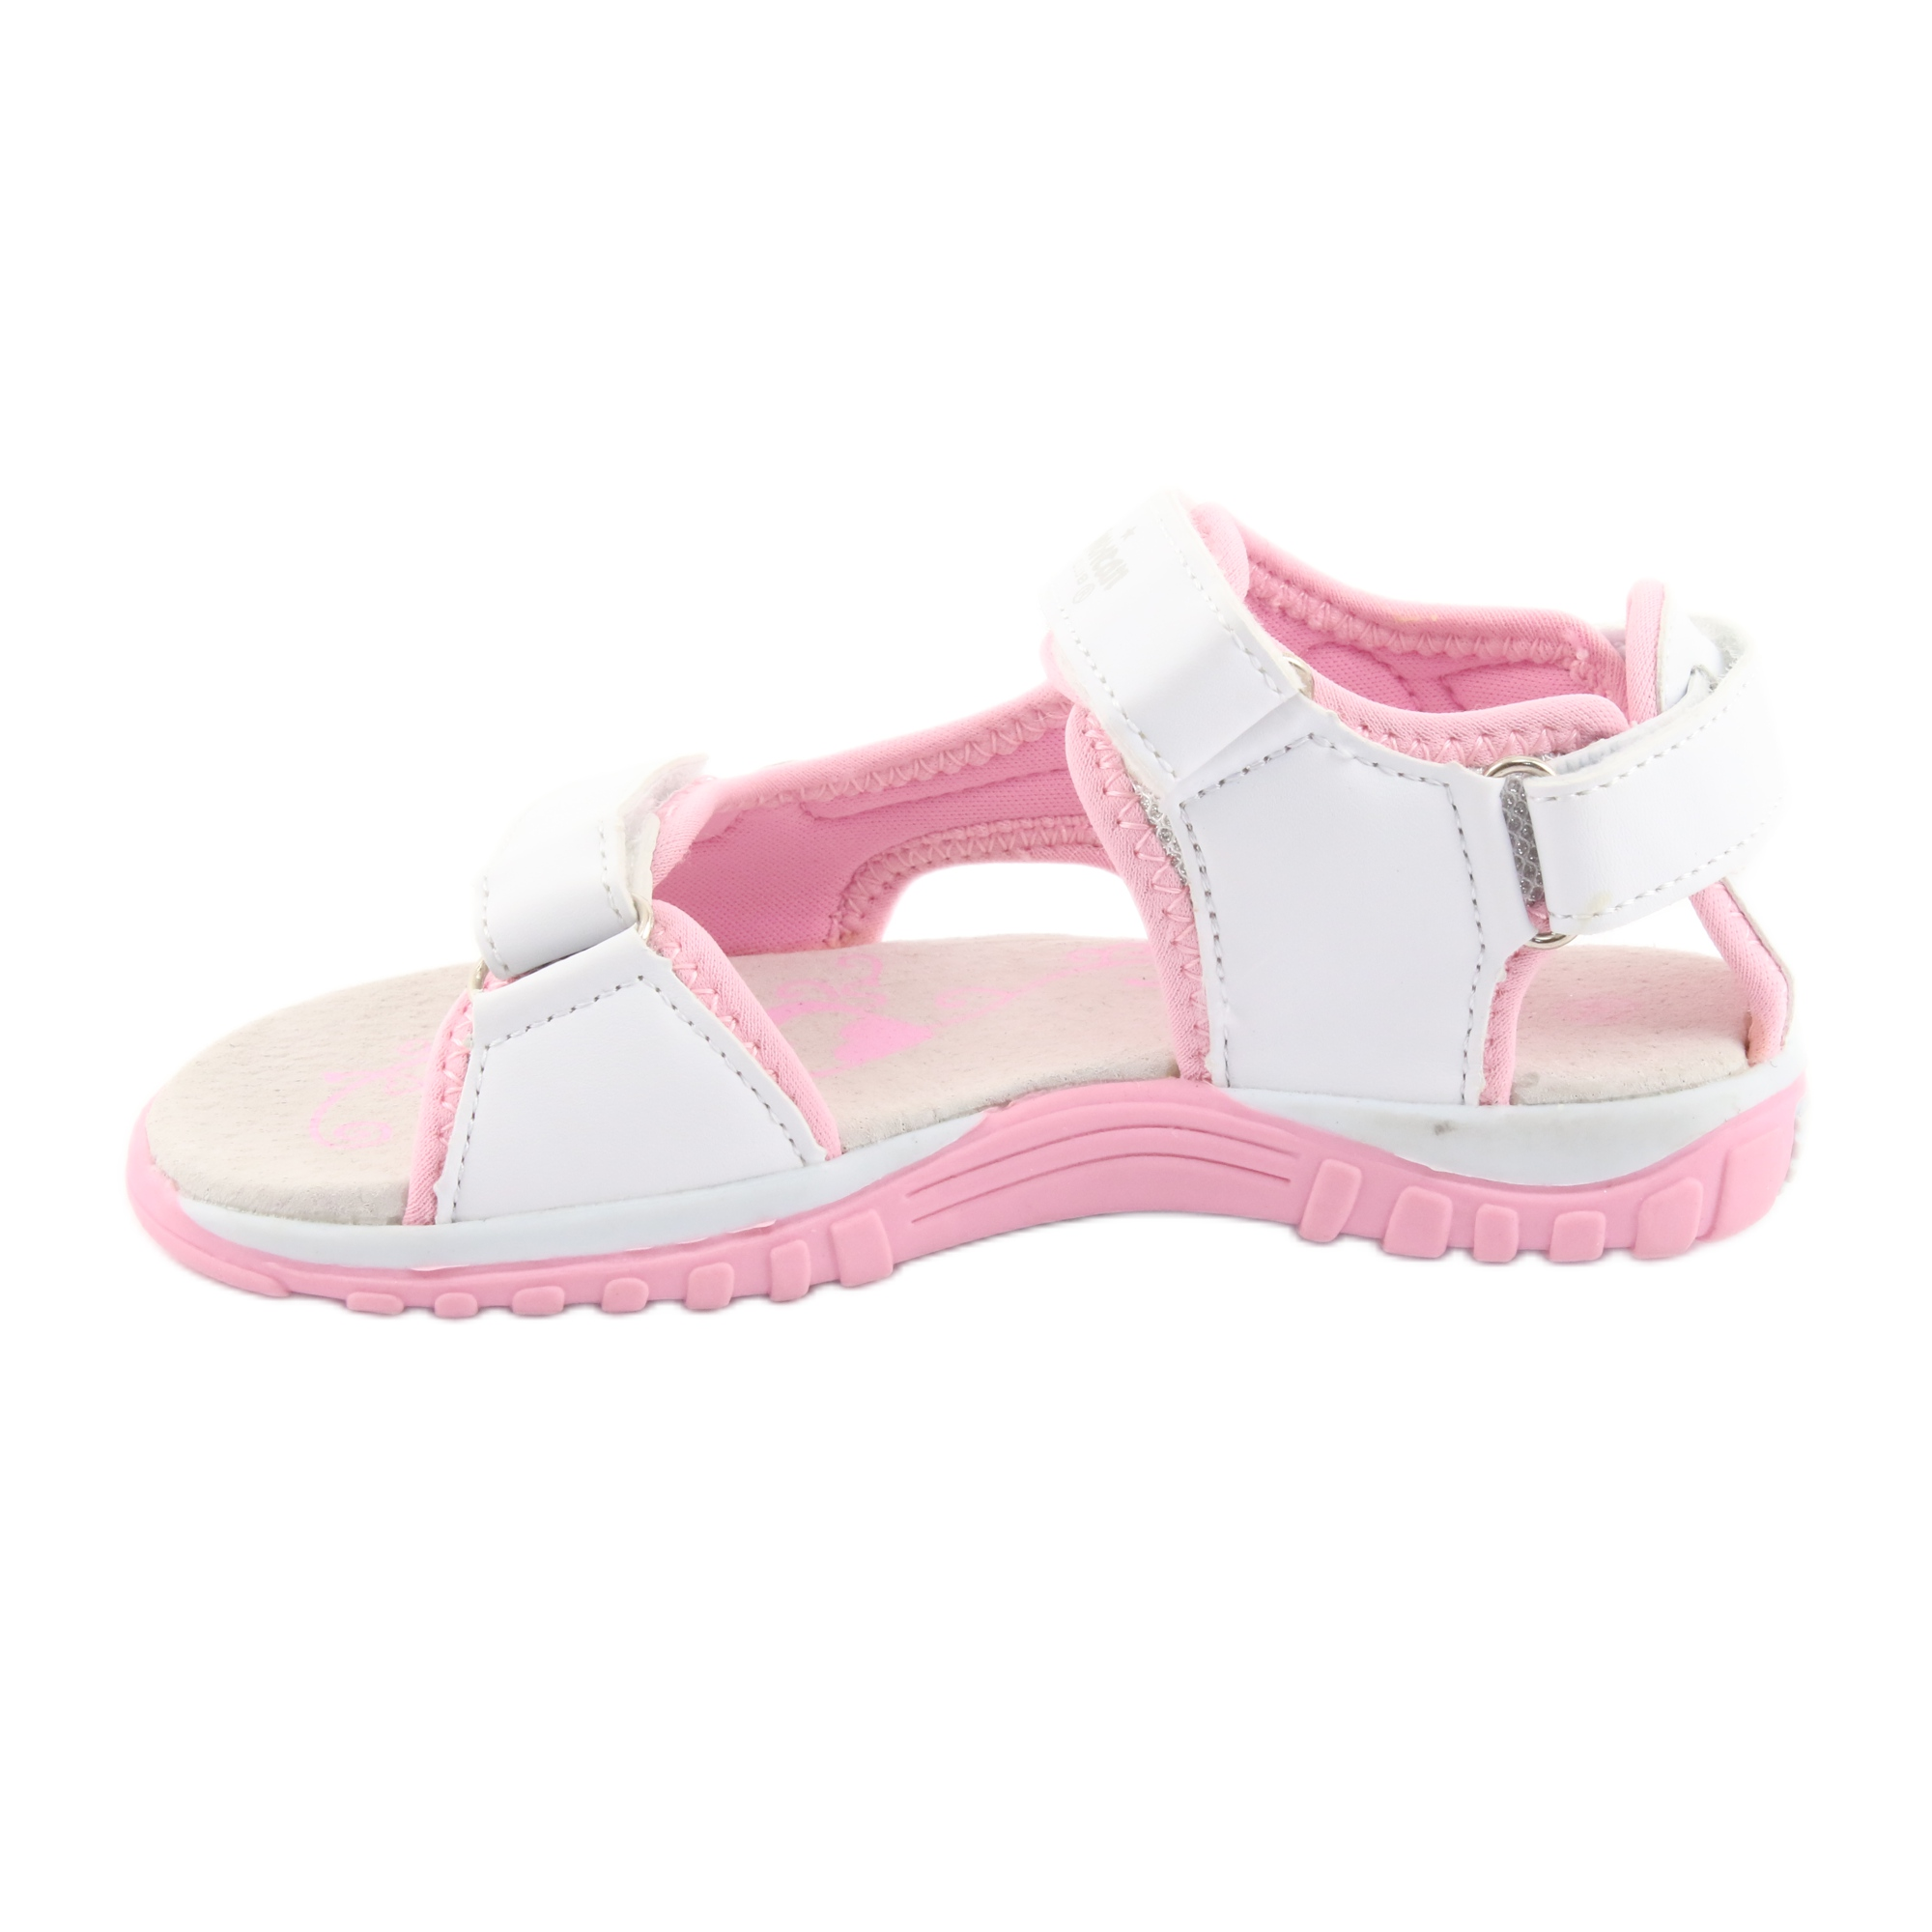 miniatura 3 - Sandali da donna di American Club bianco grigio rosa